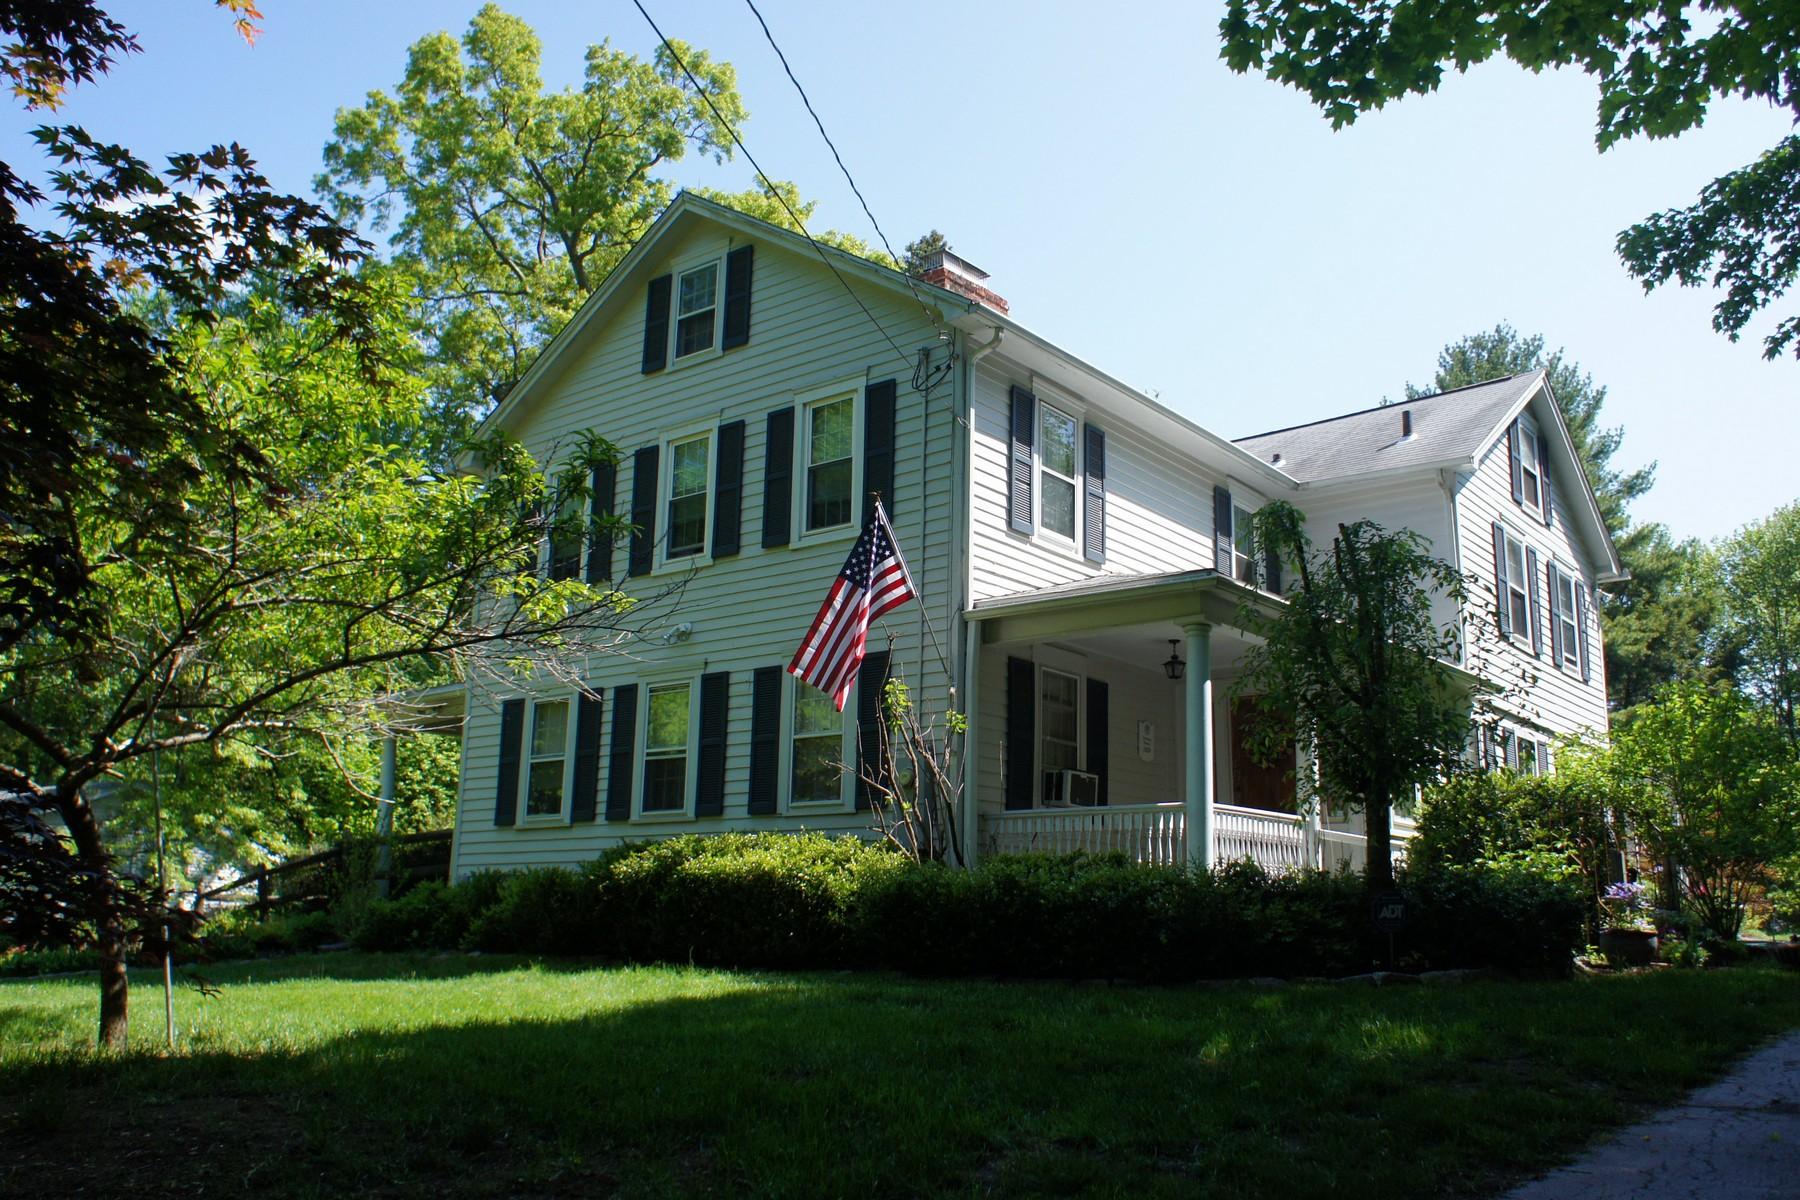 Vivienda unifamiliar por un Venta en The Sturges House - Beautiful Upgraded and Renovated Antique Gem 228 Wolfpit Avenue Norwalk, Connecticut, 06851 Estados Unidos